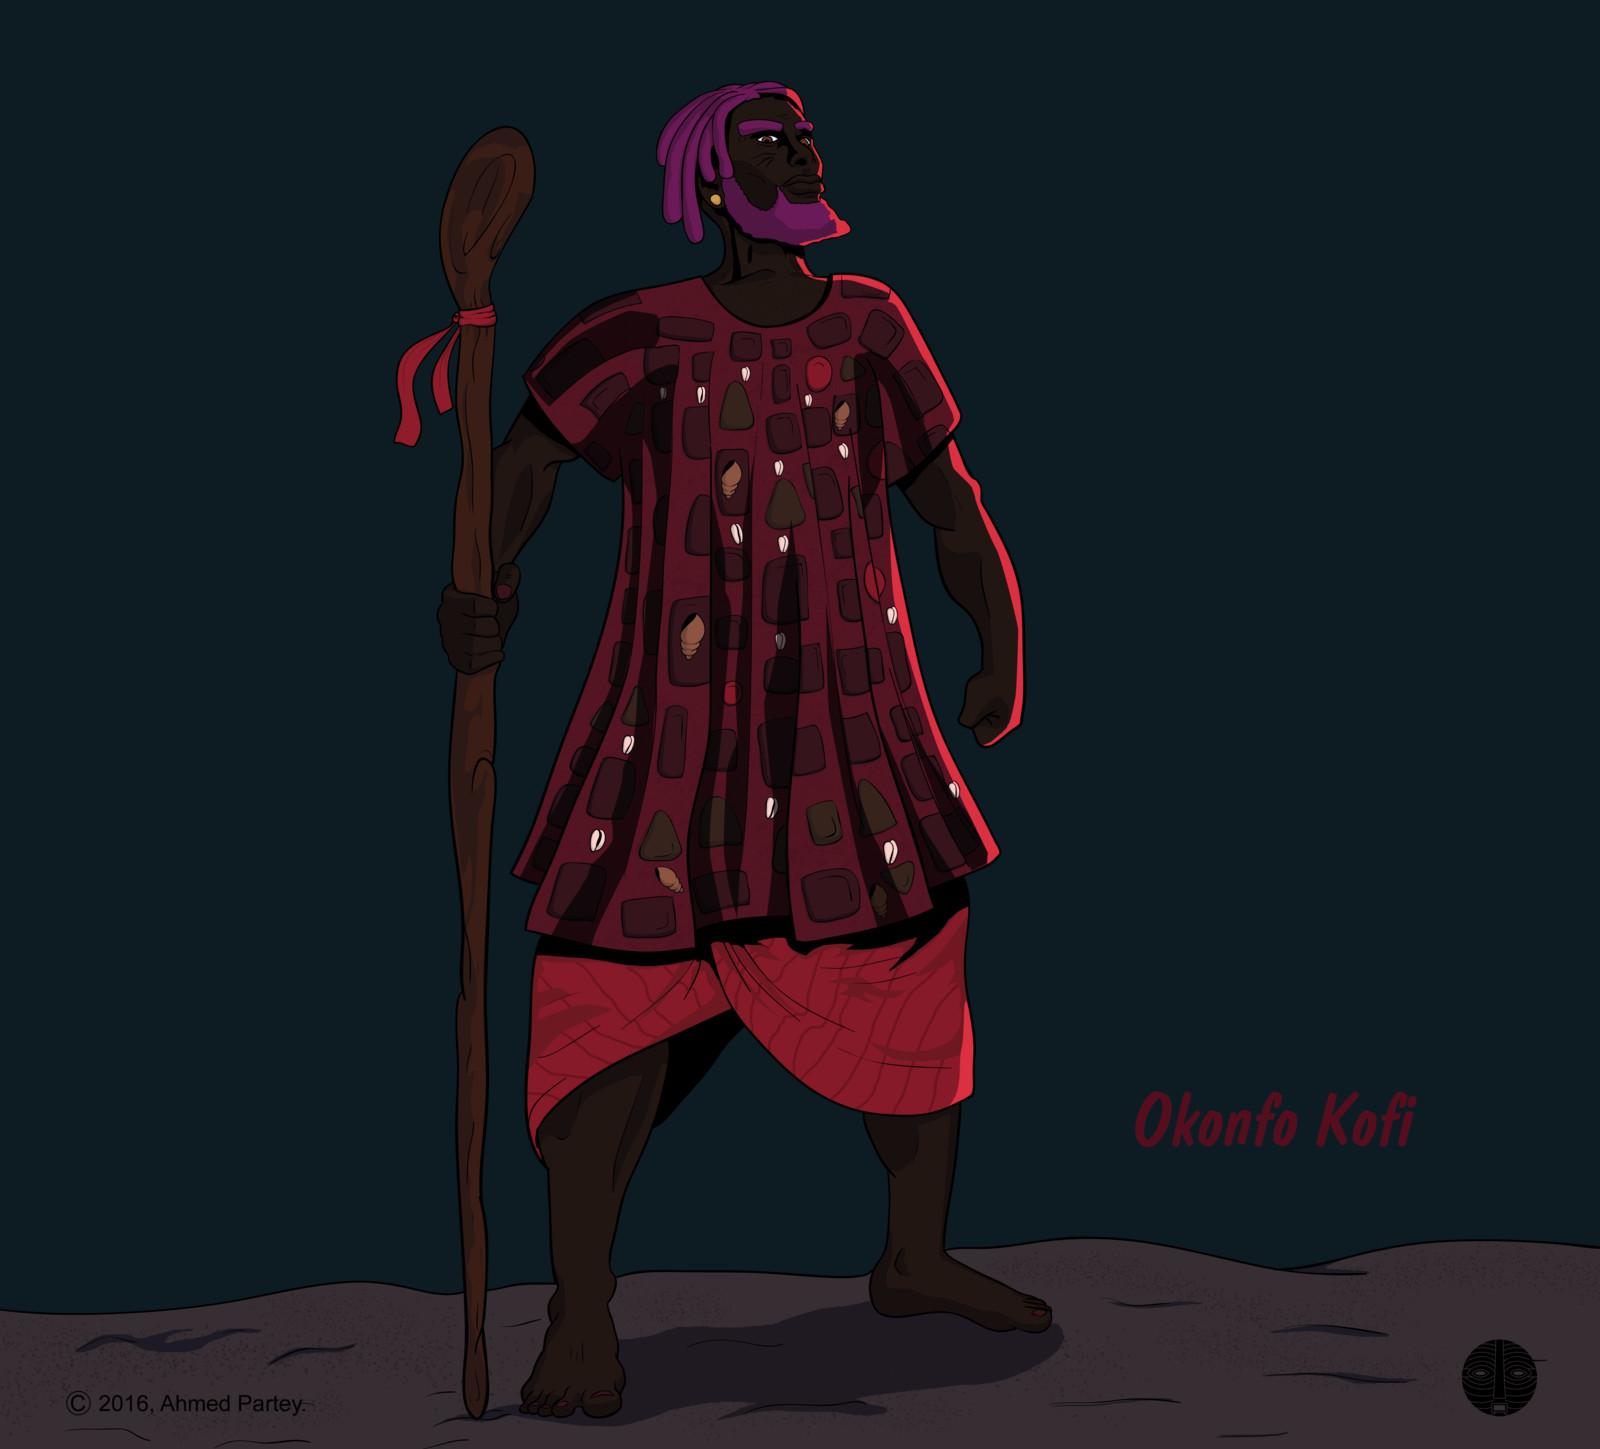 Warriors, Okonfo Kofi